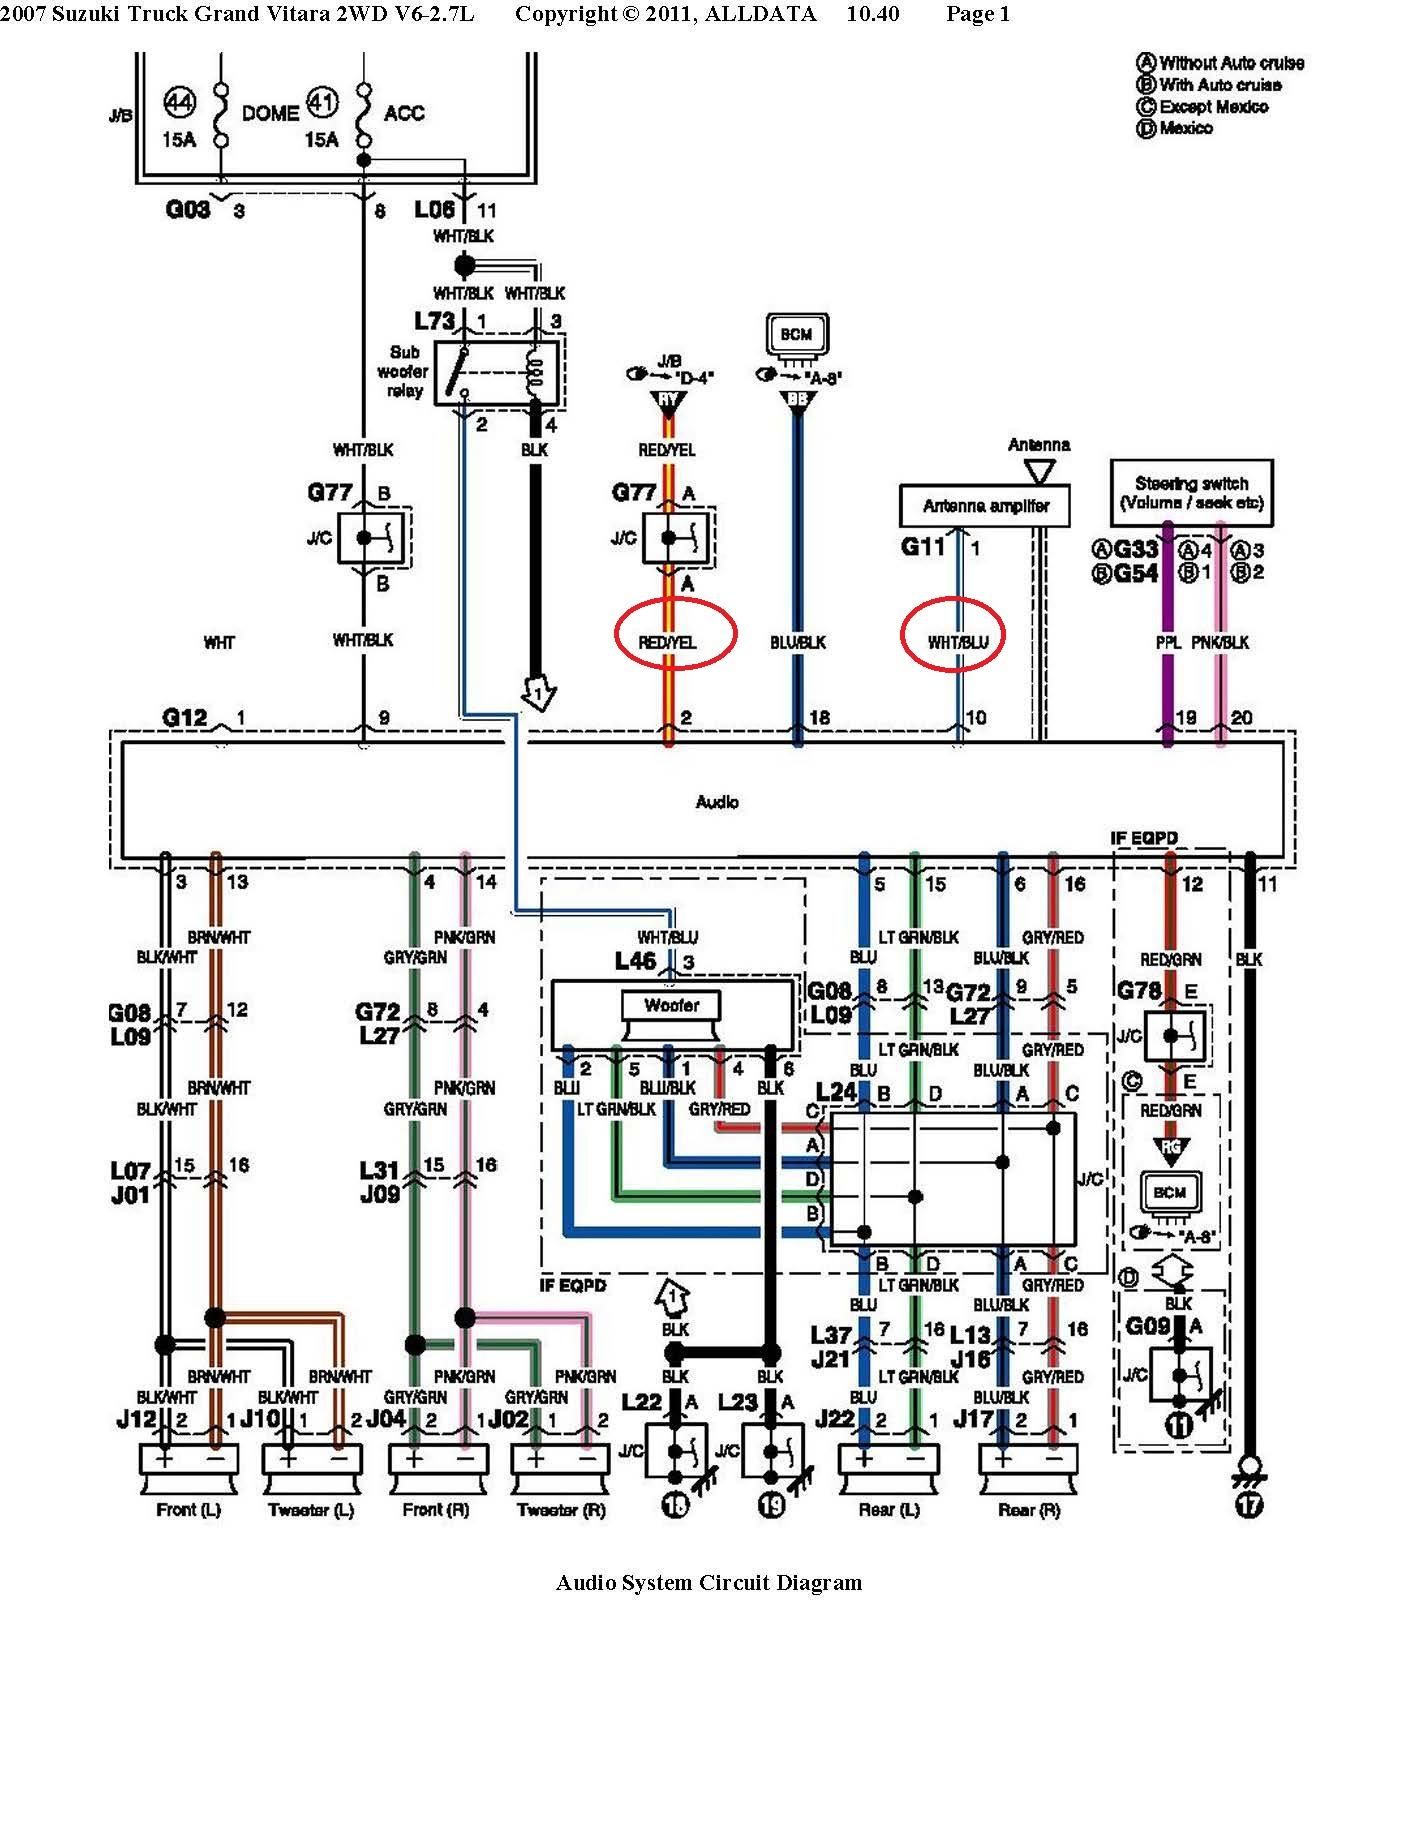 Diagram Car Stereo Wiring Diagram Suzuki Full Version Hd Quality Diagram Suzuki Diagramildah Macchineassemblaggio It